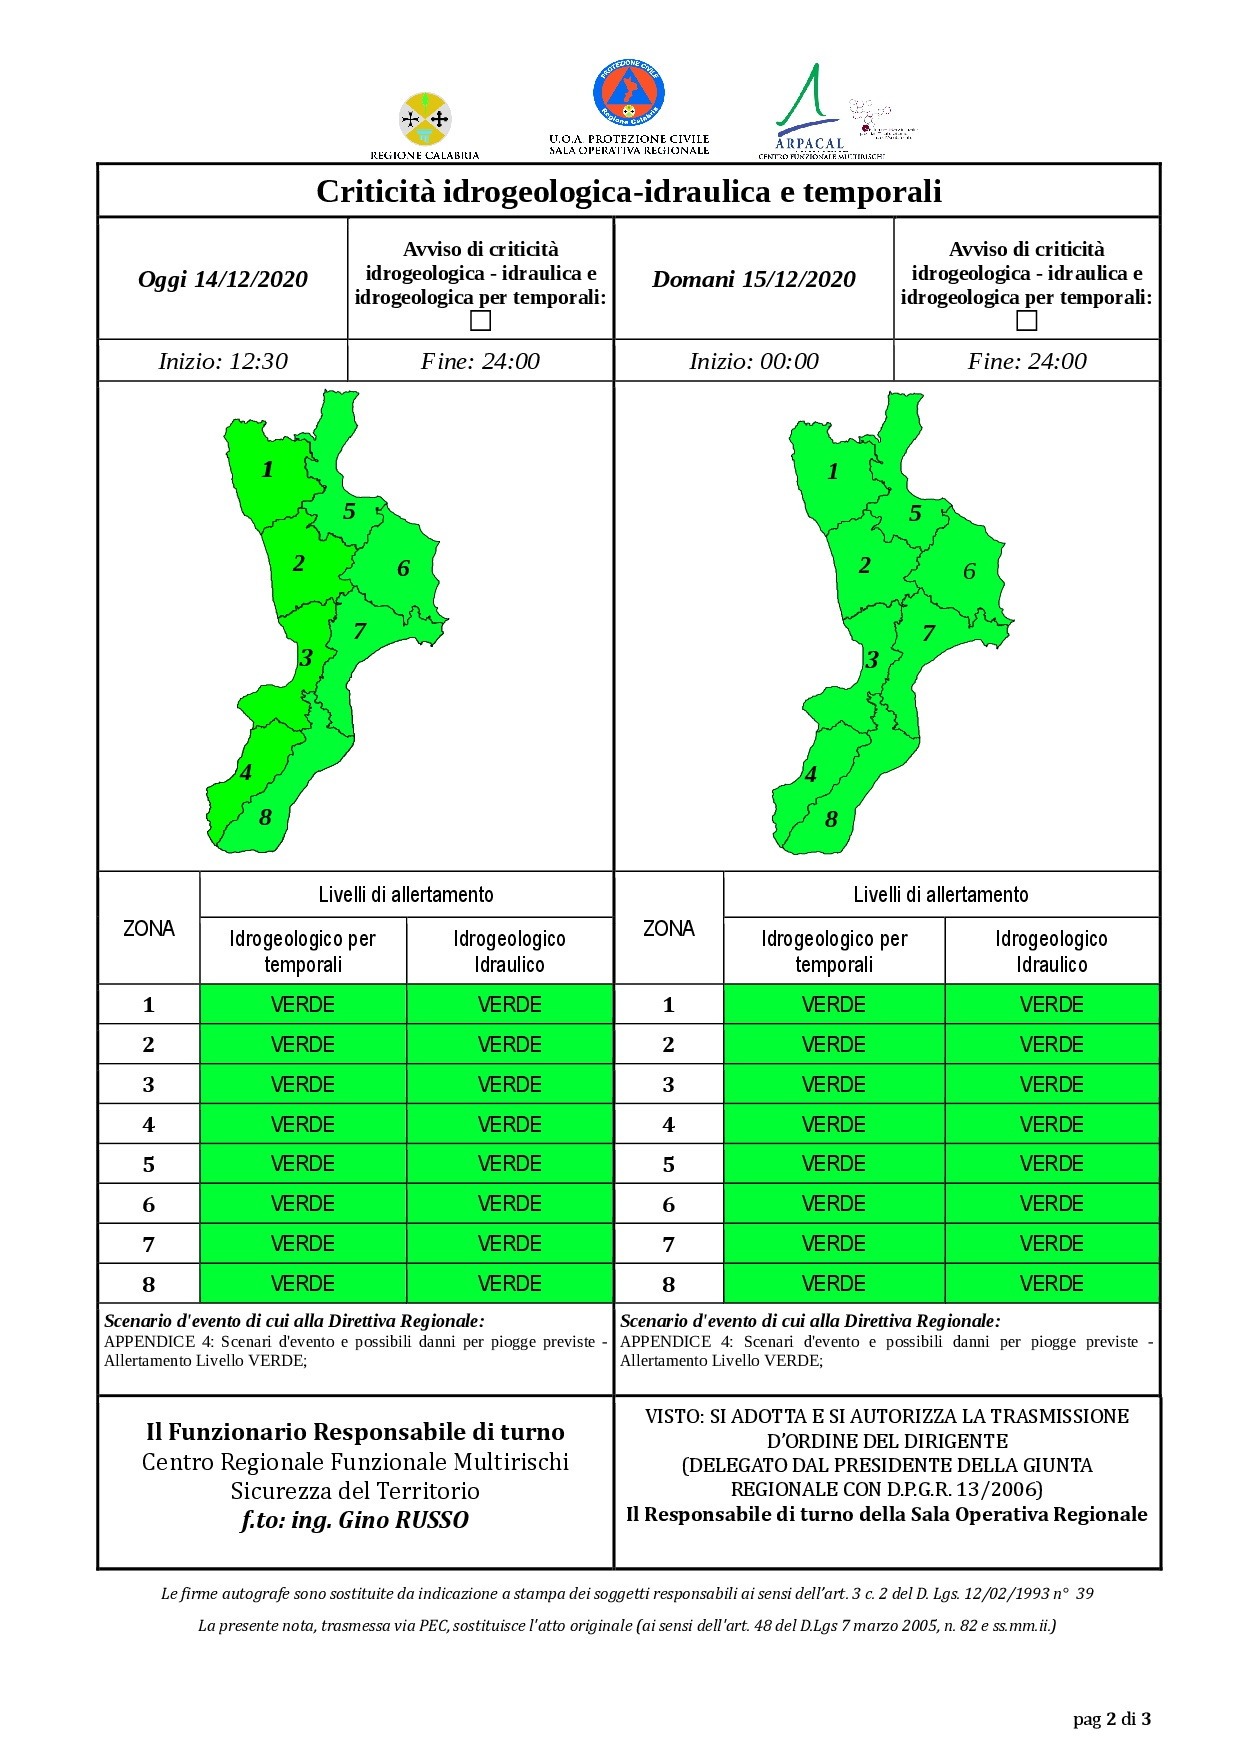 Criticità idrogeologica-idraulica e temporali in Calabria 14-12-2020